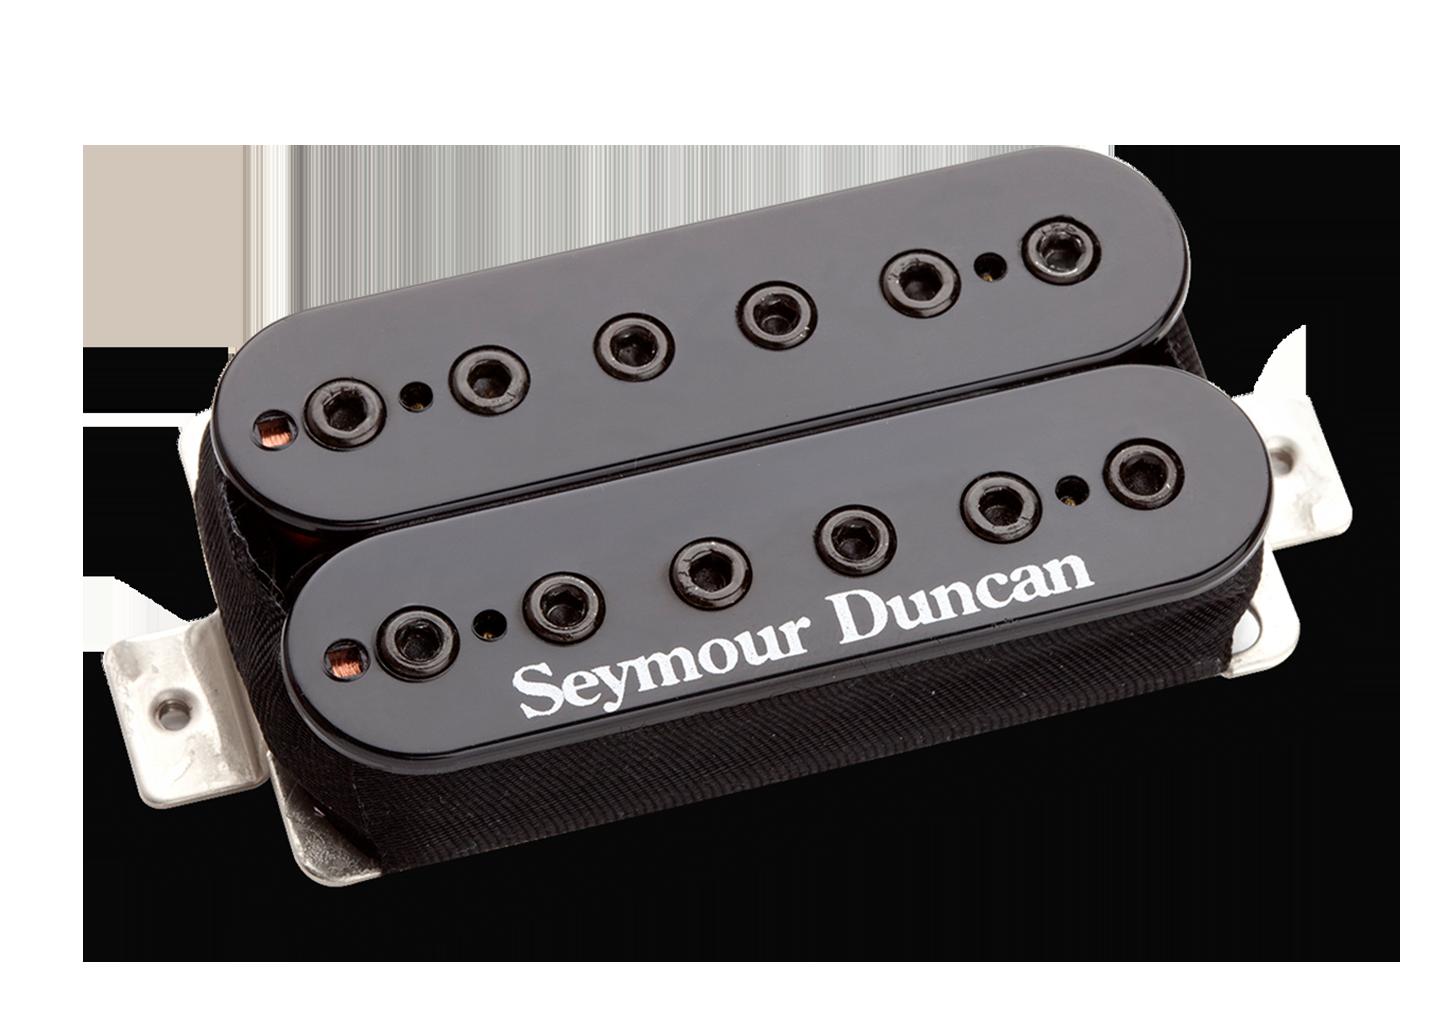 Seymour Duncan Full Shred Humbucker - SH-10B Bridge Black